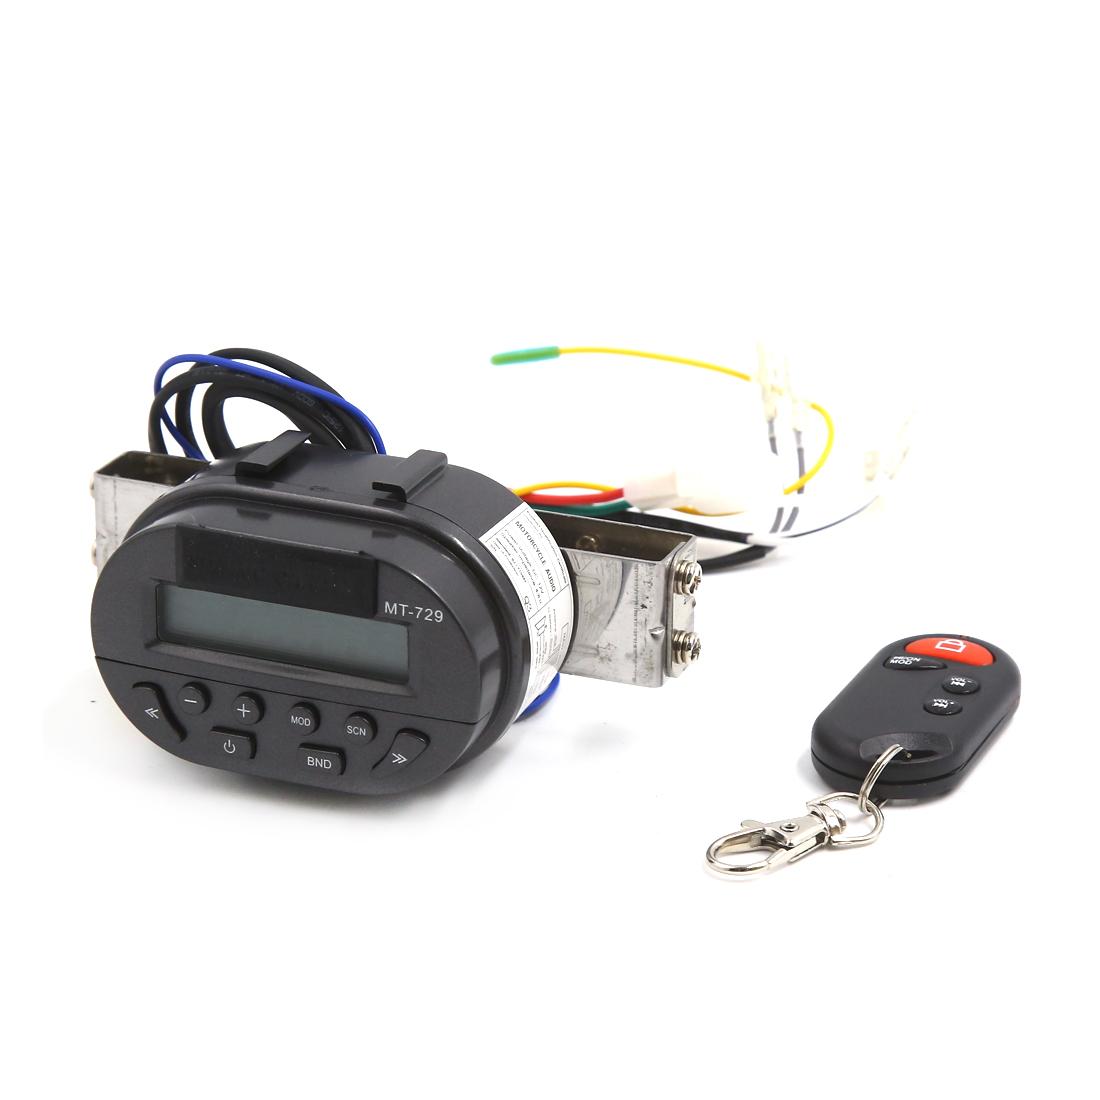 MT729 Motorcycle Handlebar Mount Audio Radio System MP3 Player Remote Control